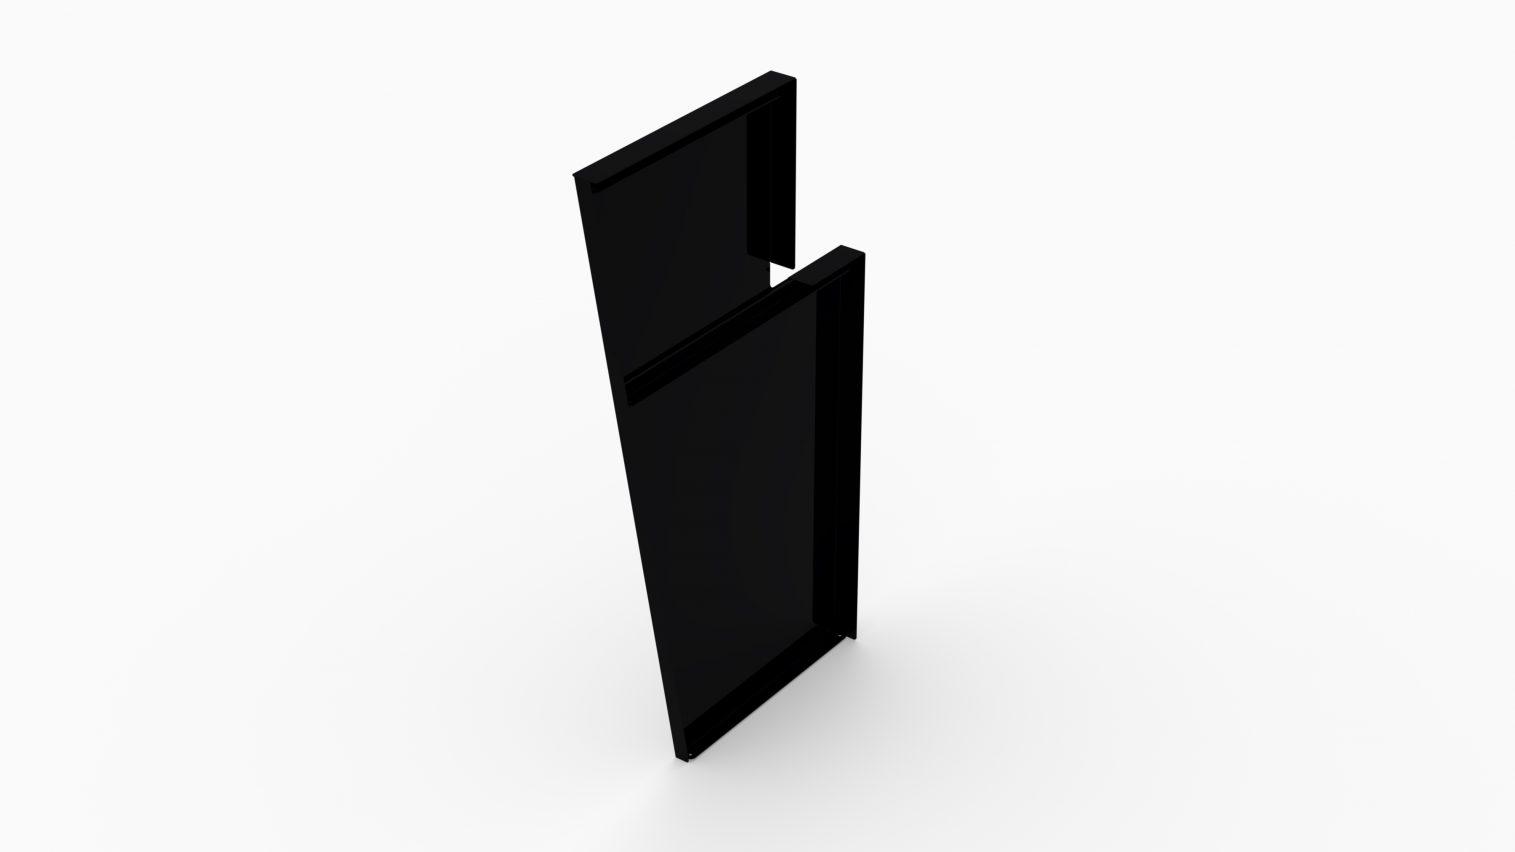 Barlok® End Panel RH x 1